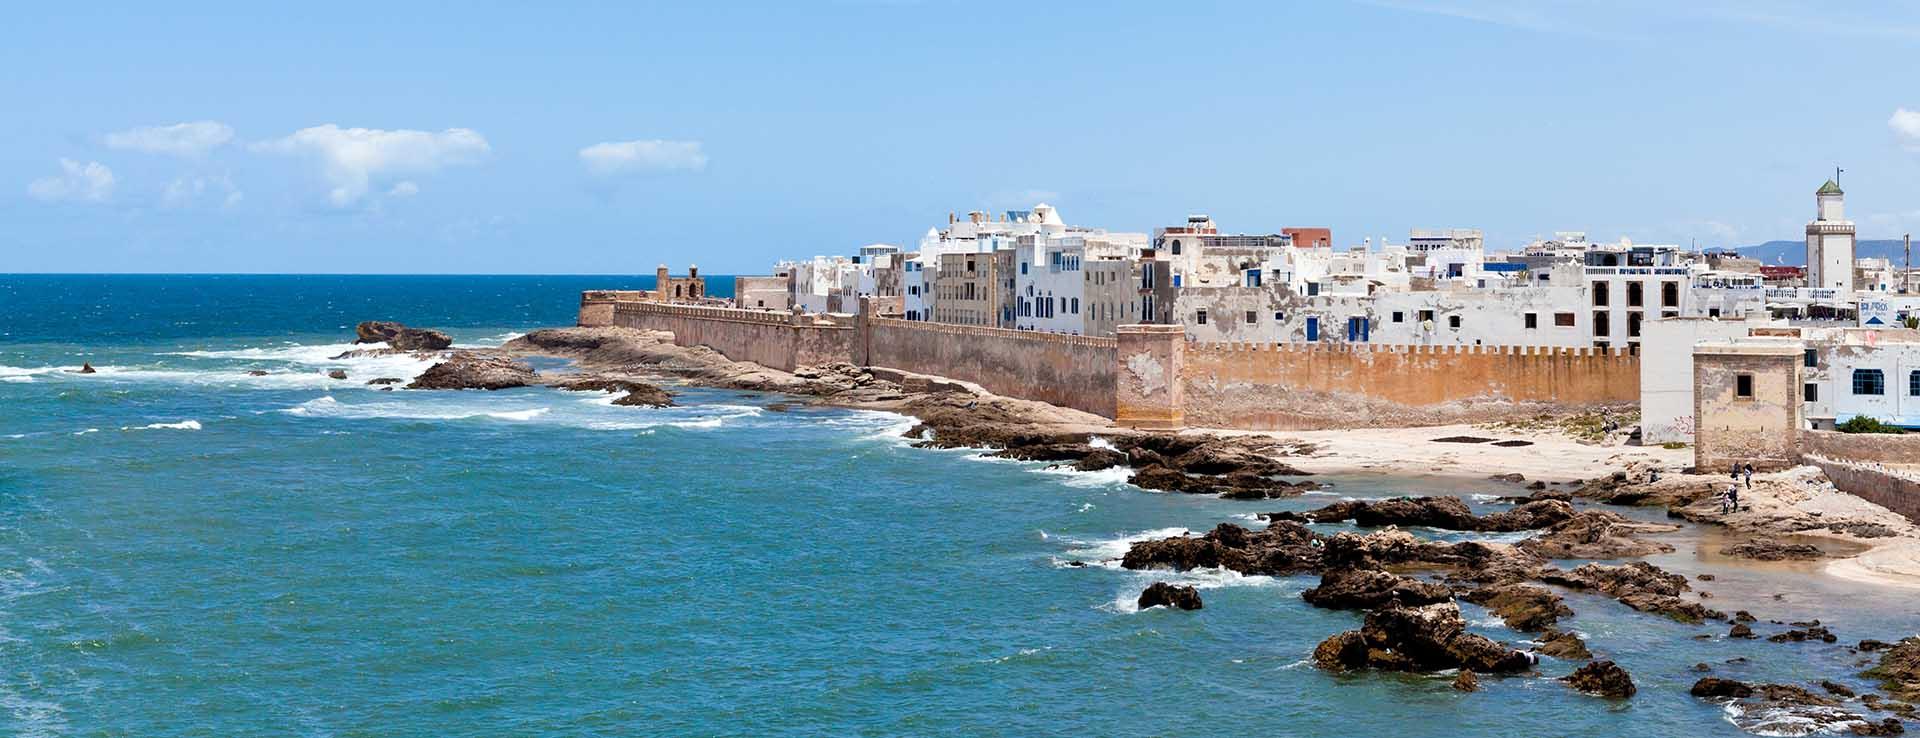 private tours to morocco beaches